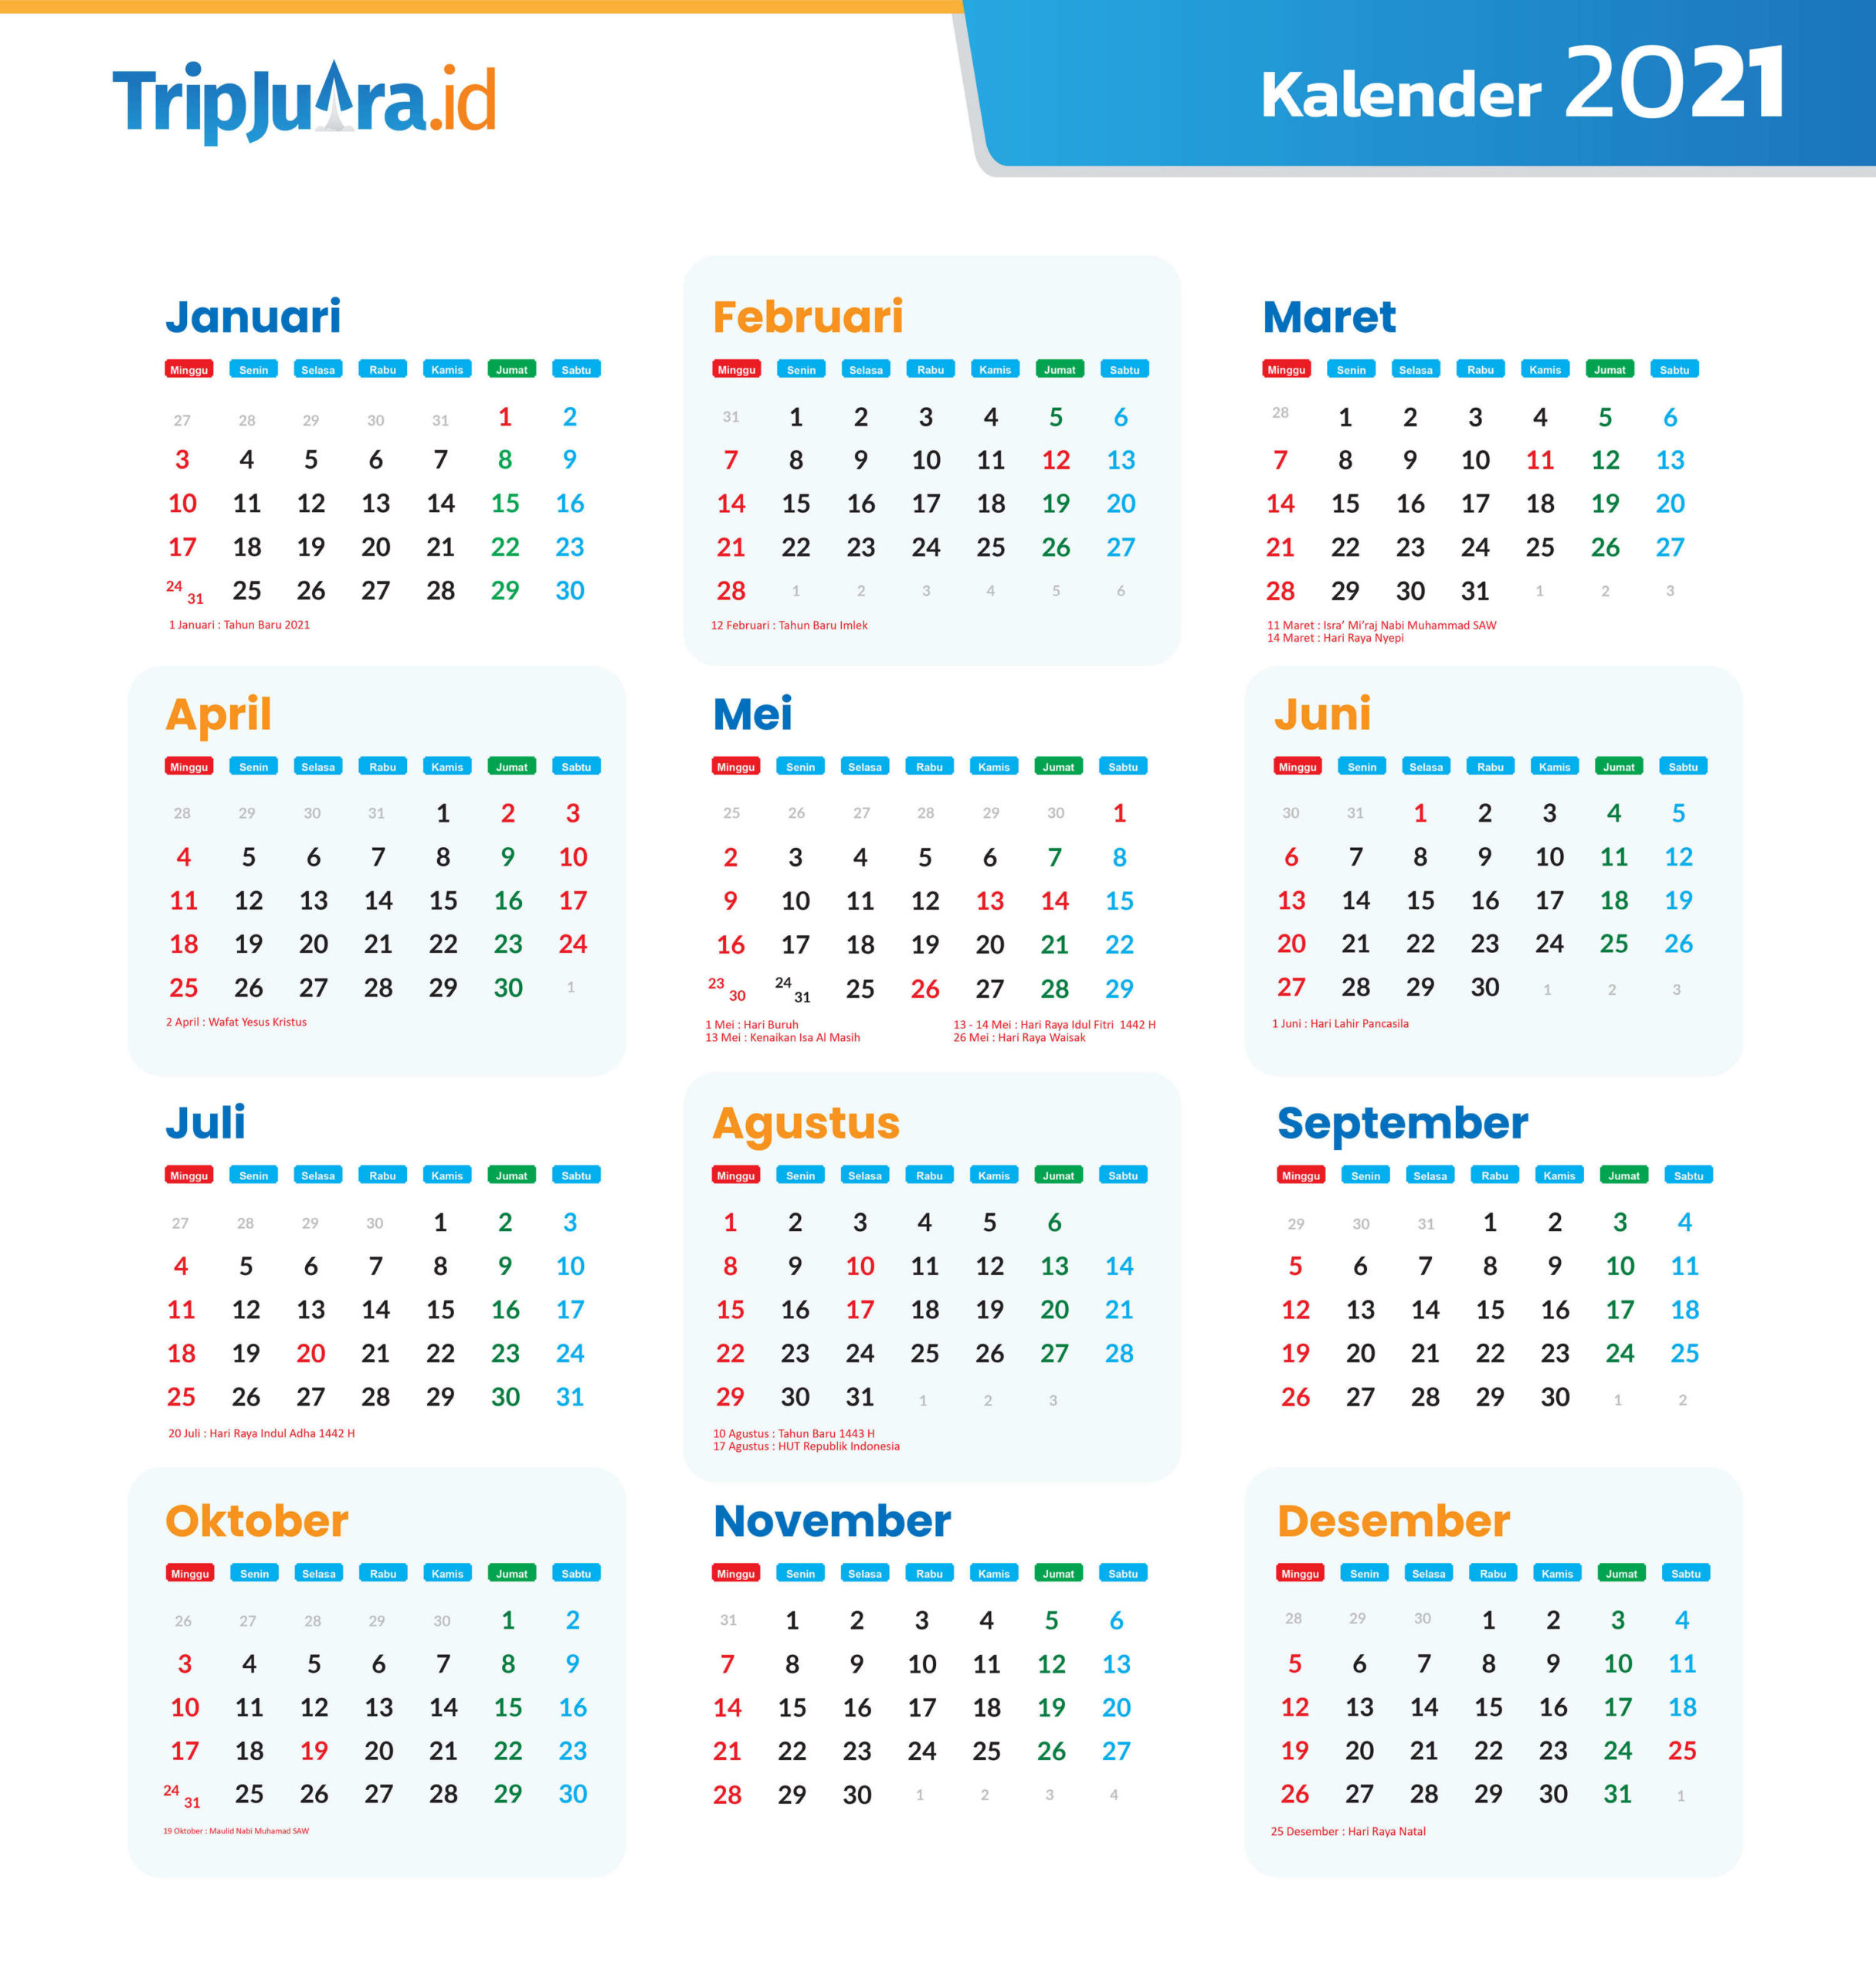 Kalender 2021 Indonesia